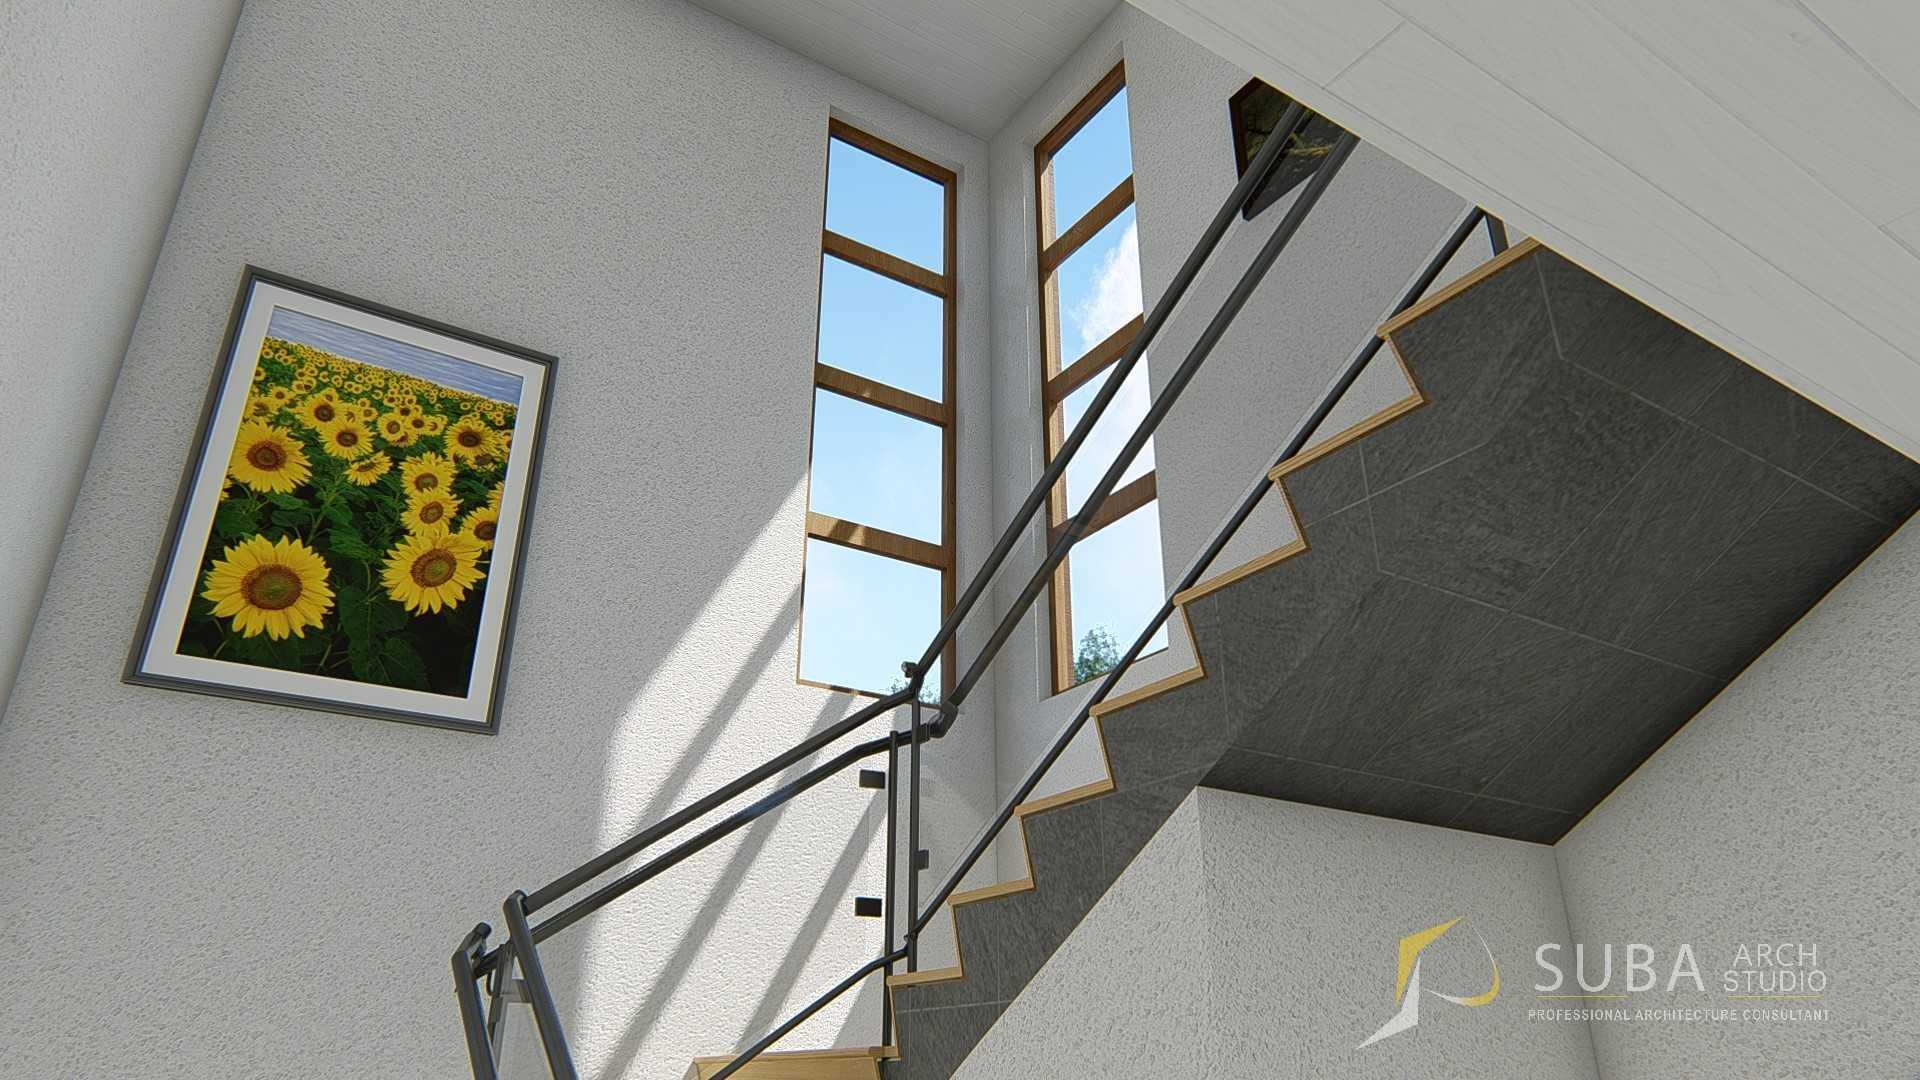 Suba-Arch Desain Rencana Rumah Tinggal 2Lt 13 X 17 @bu Wita Padang, Kota Padang, Sumatera Barat, Indonesia Padang, Kota Padang, Sumatera Barat, Indonesia Suba-Arch-Desain-Rencana-Rumah-Tinggal-2Lt-13-X-17-Bu-Wita  86846